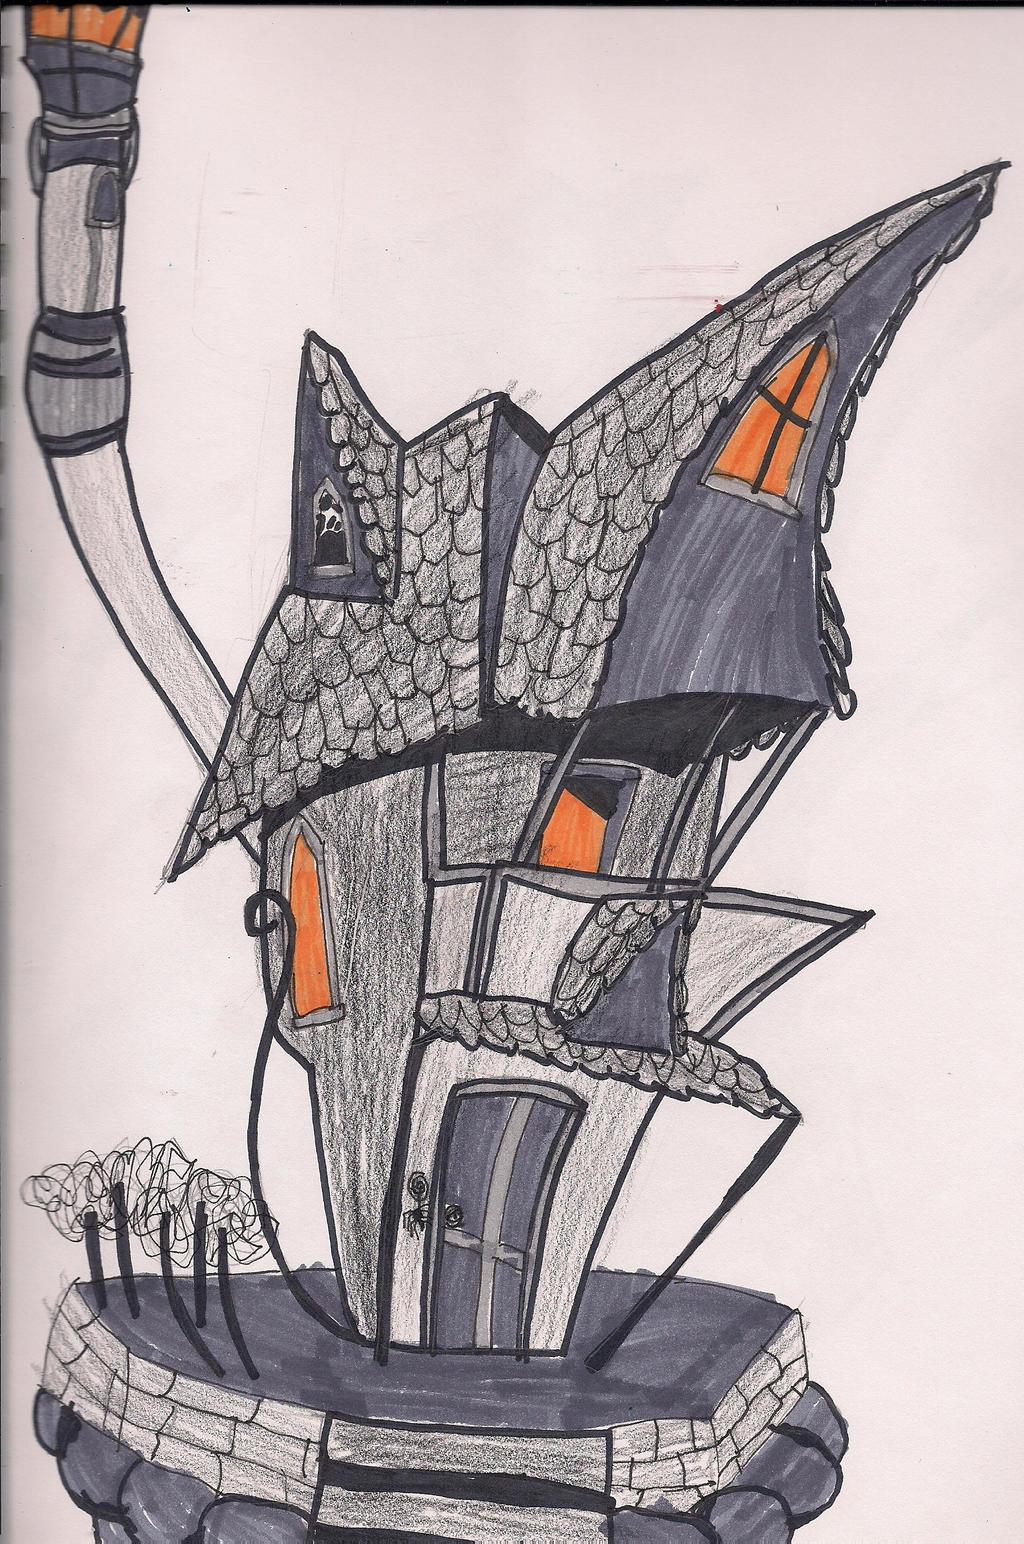 Jack Skellington's house by digirobotphantom10 on DeviantArt